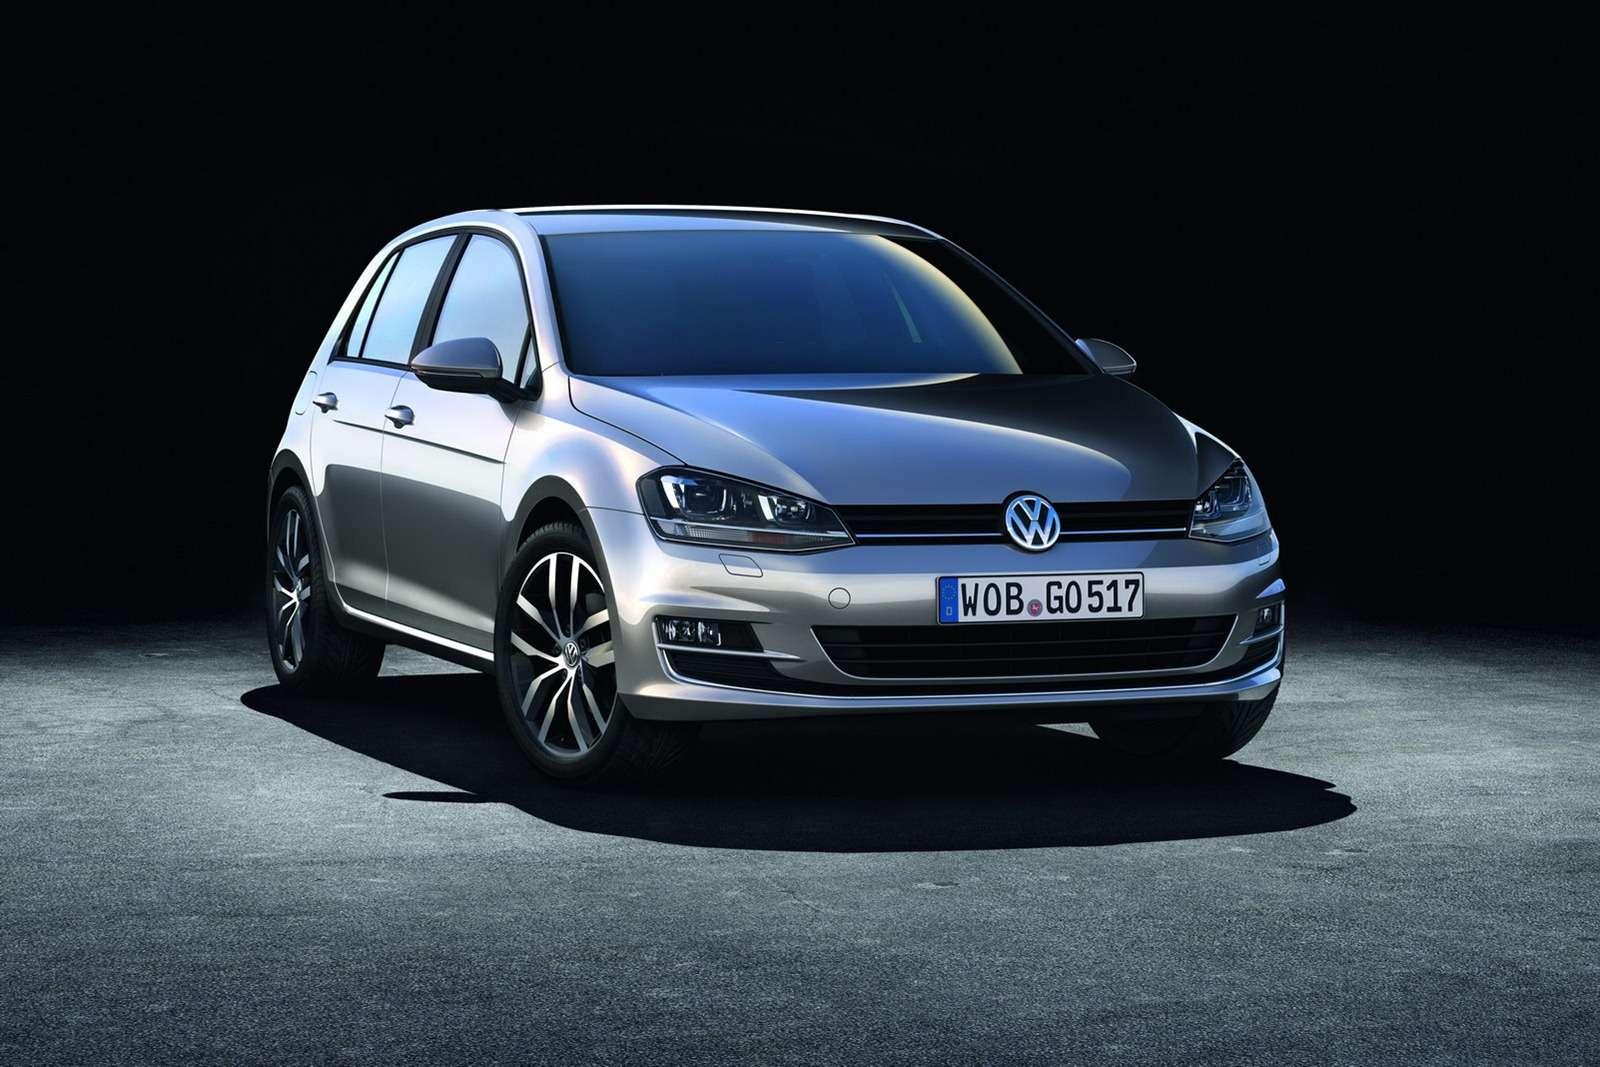 Volkswagen Golf VII 2013